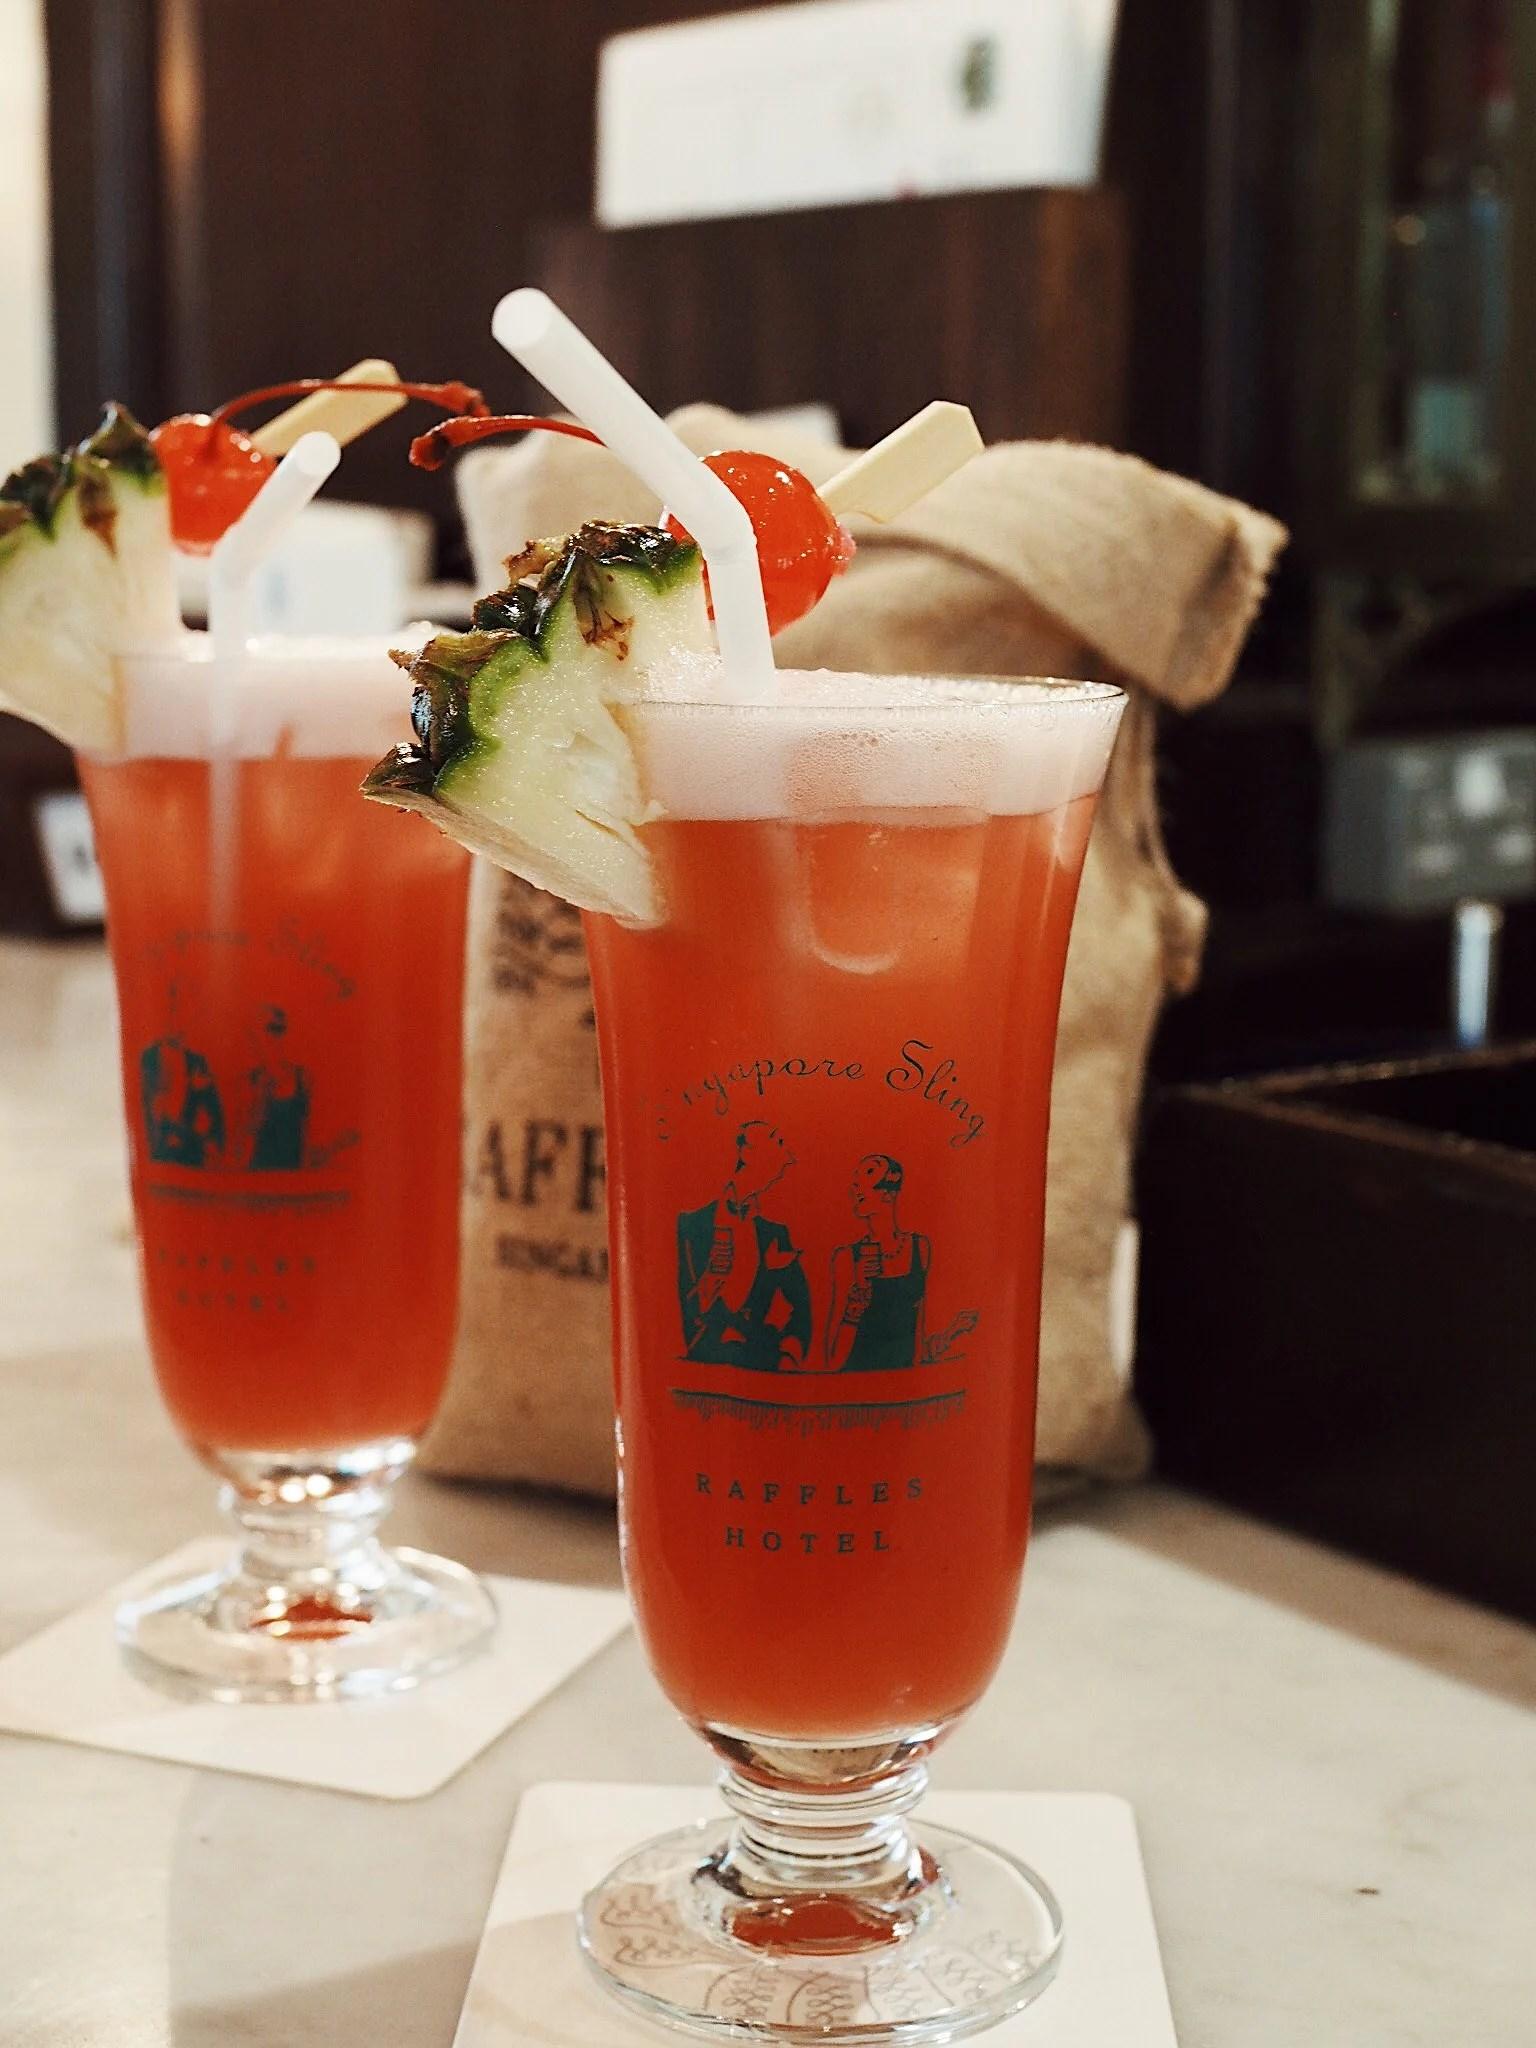 Singapore Sling at Raffles Hotel